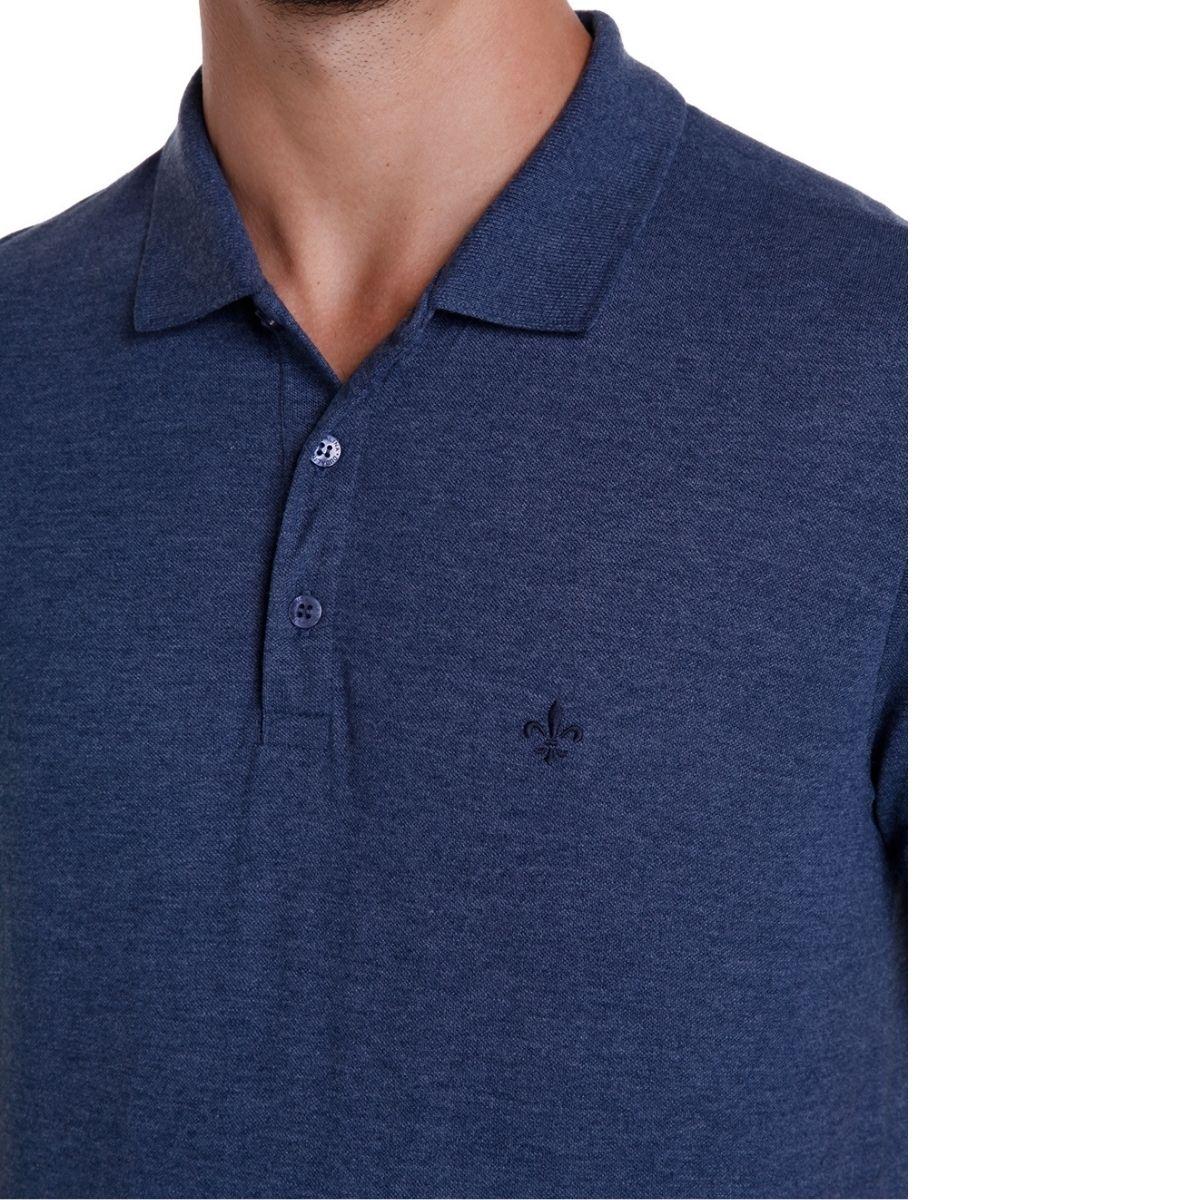 Camisa Dudalina Polo Manga Curta